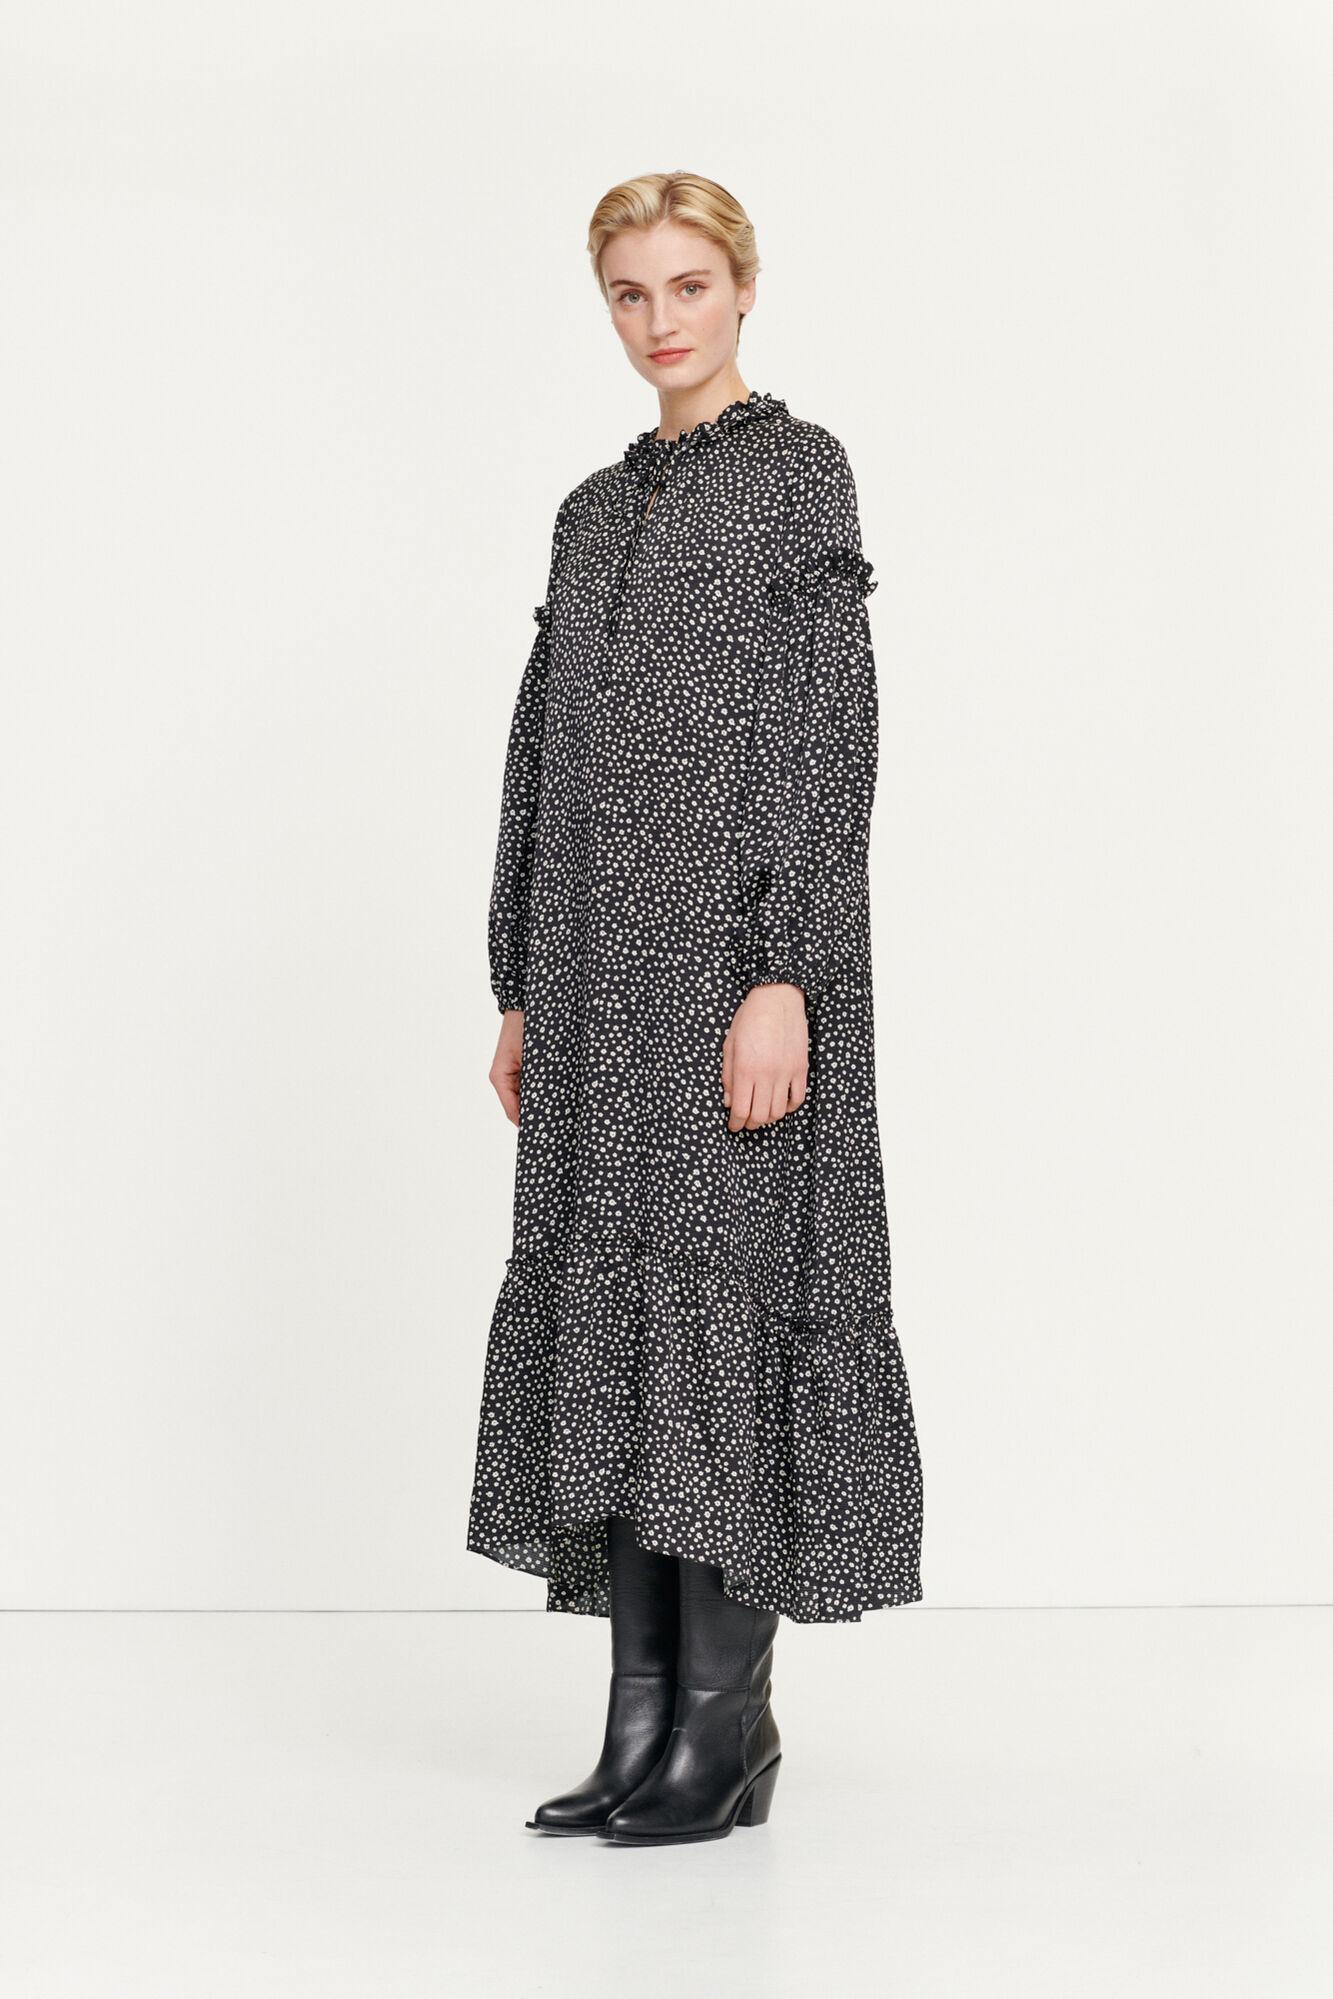 Vivre dress aop 12887